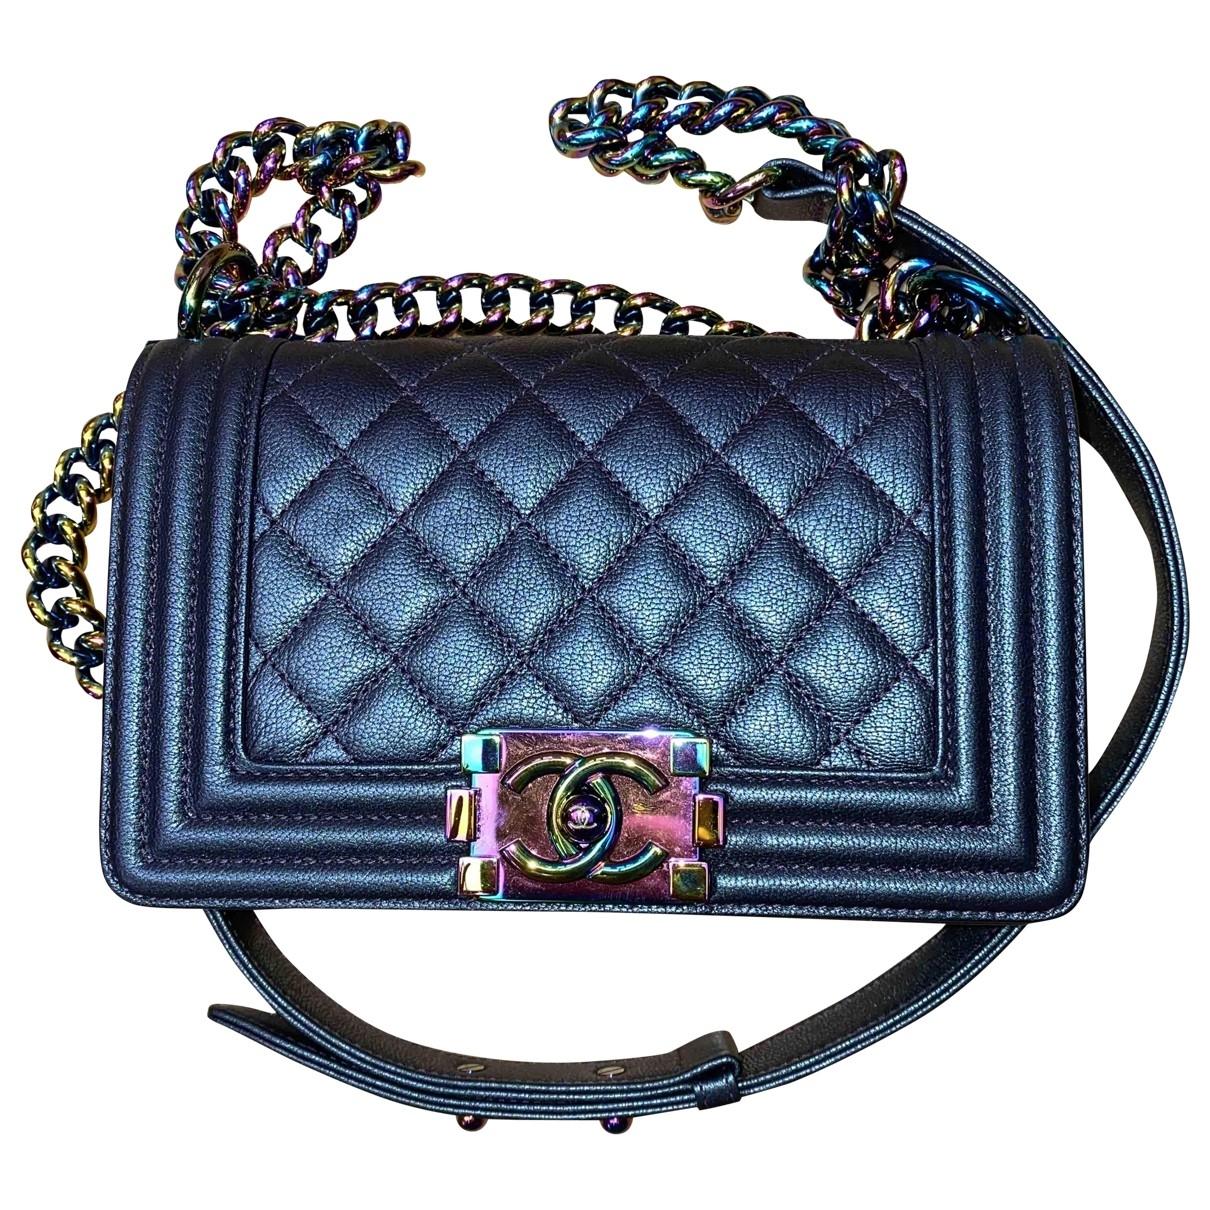 Chanel - Sac a main Boy pour femme en cuir - metallise